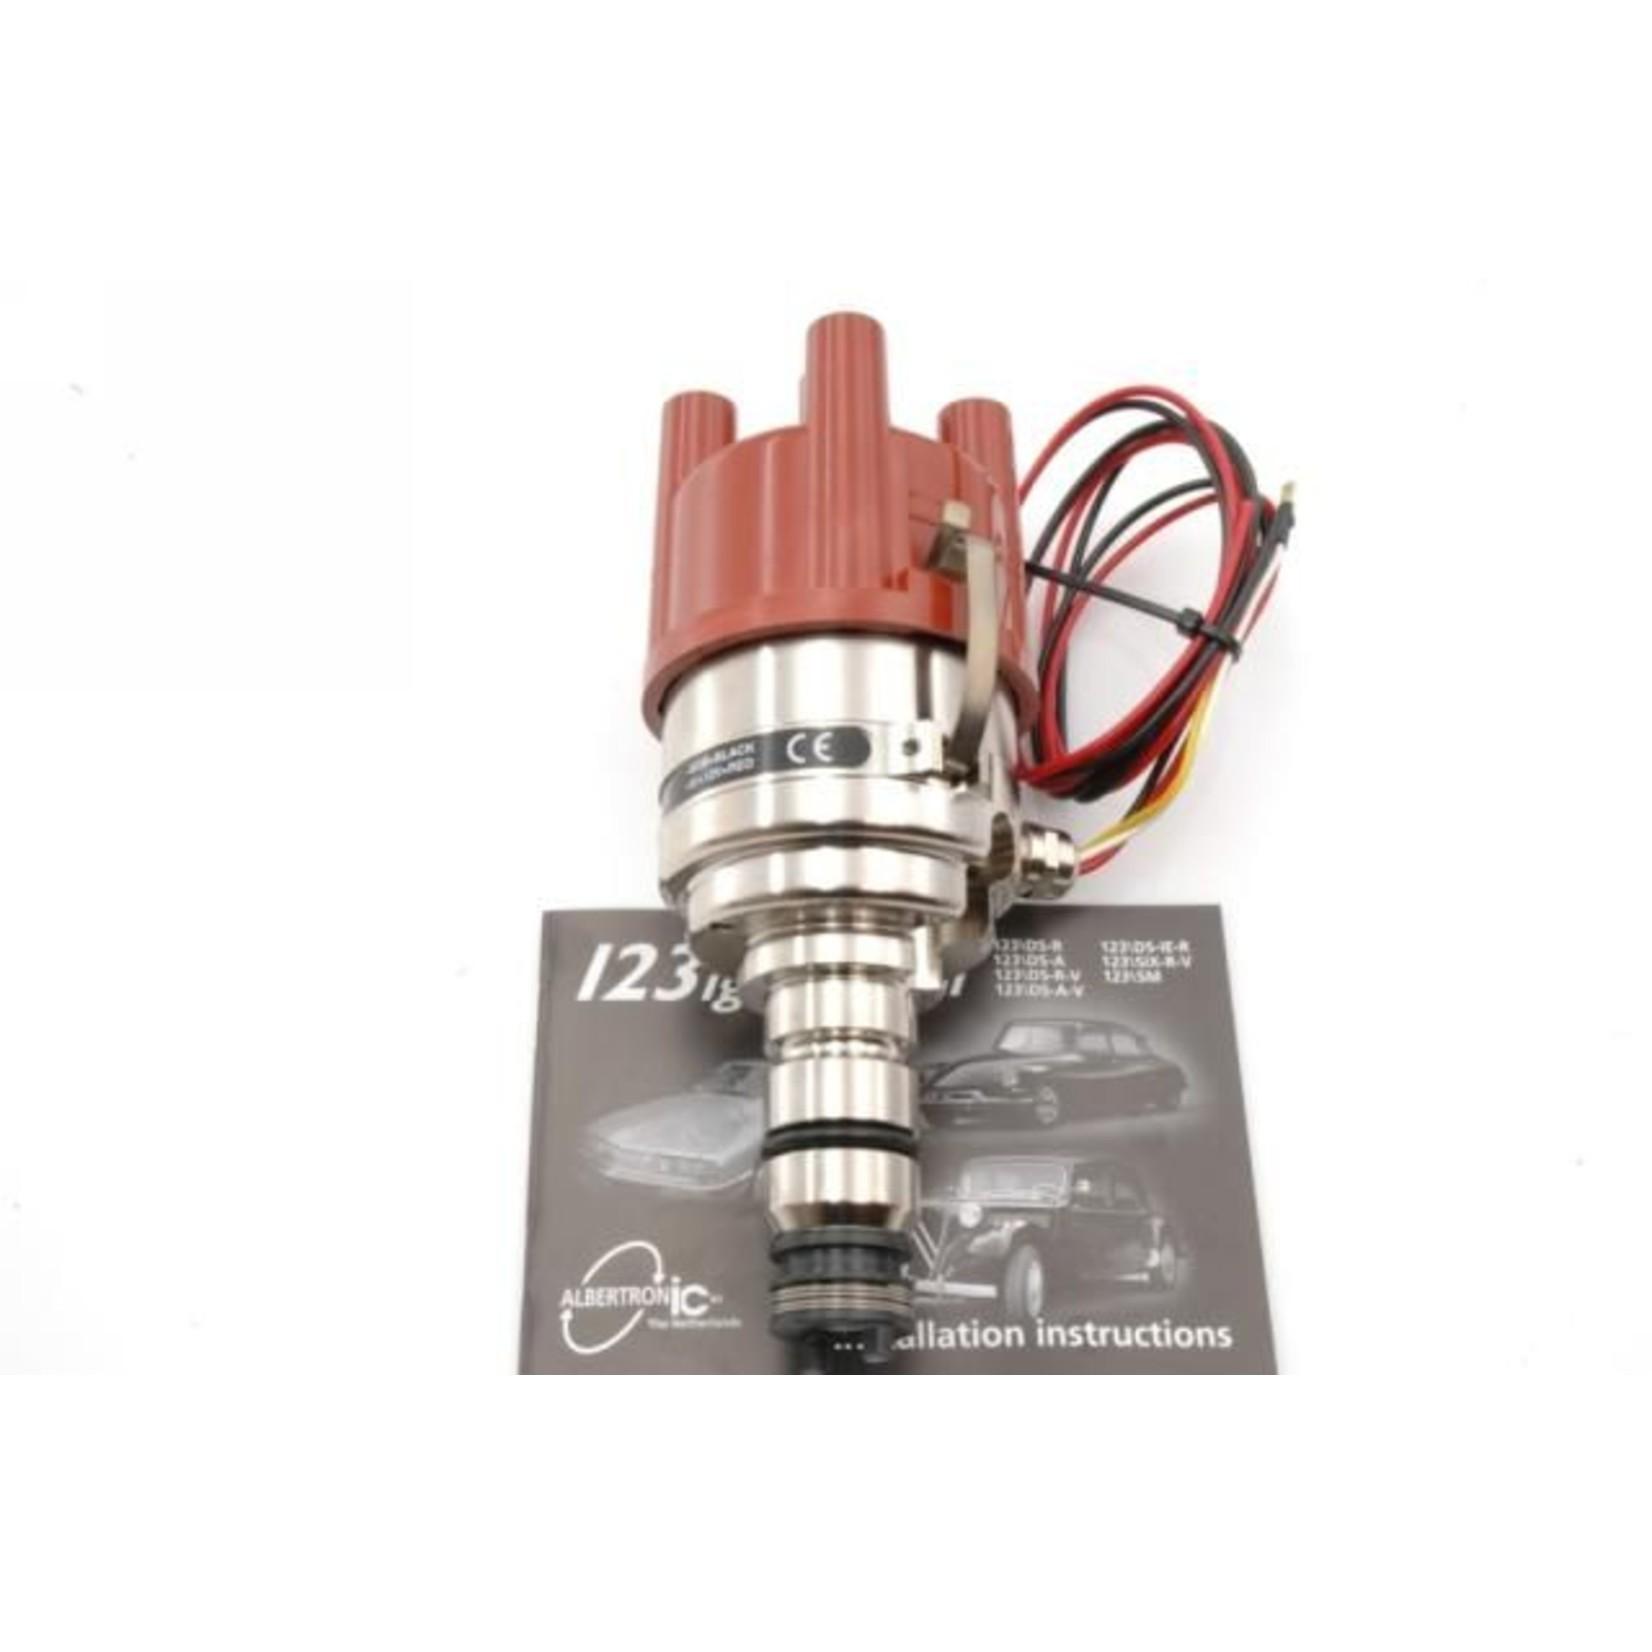 Allumeur electronic 123 Bosch Nr Org: 123/DS-IE